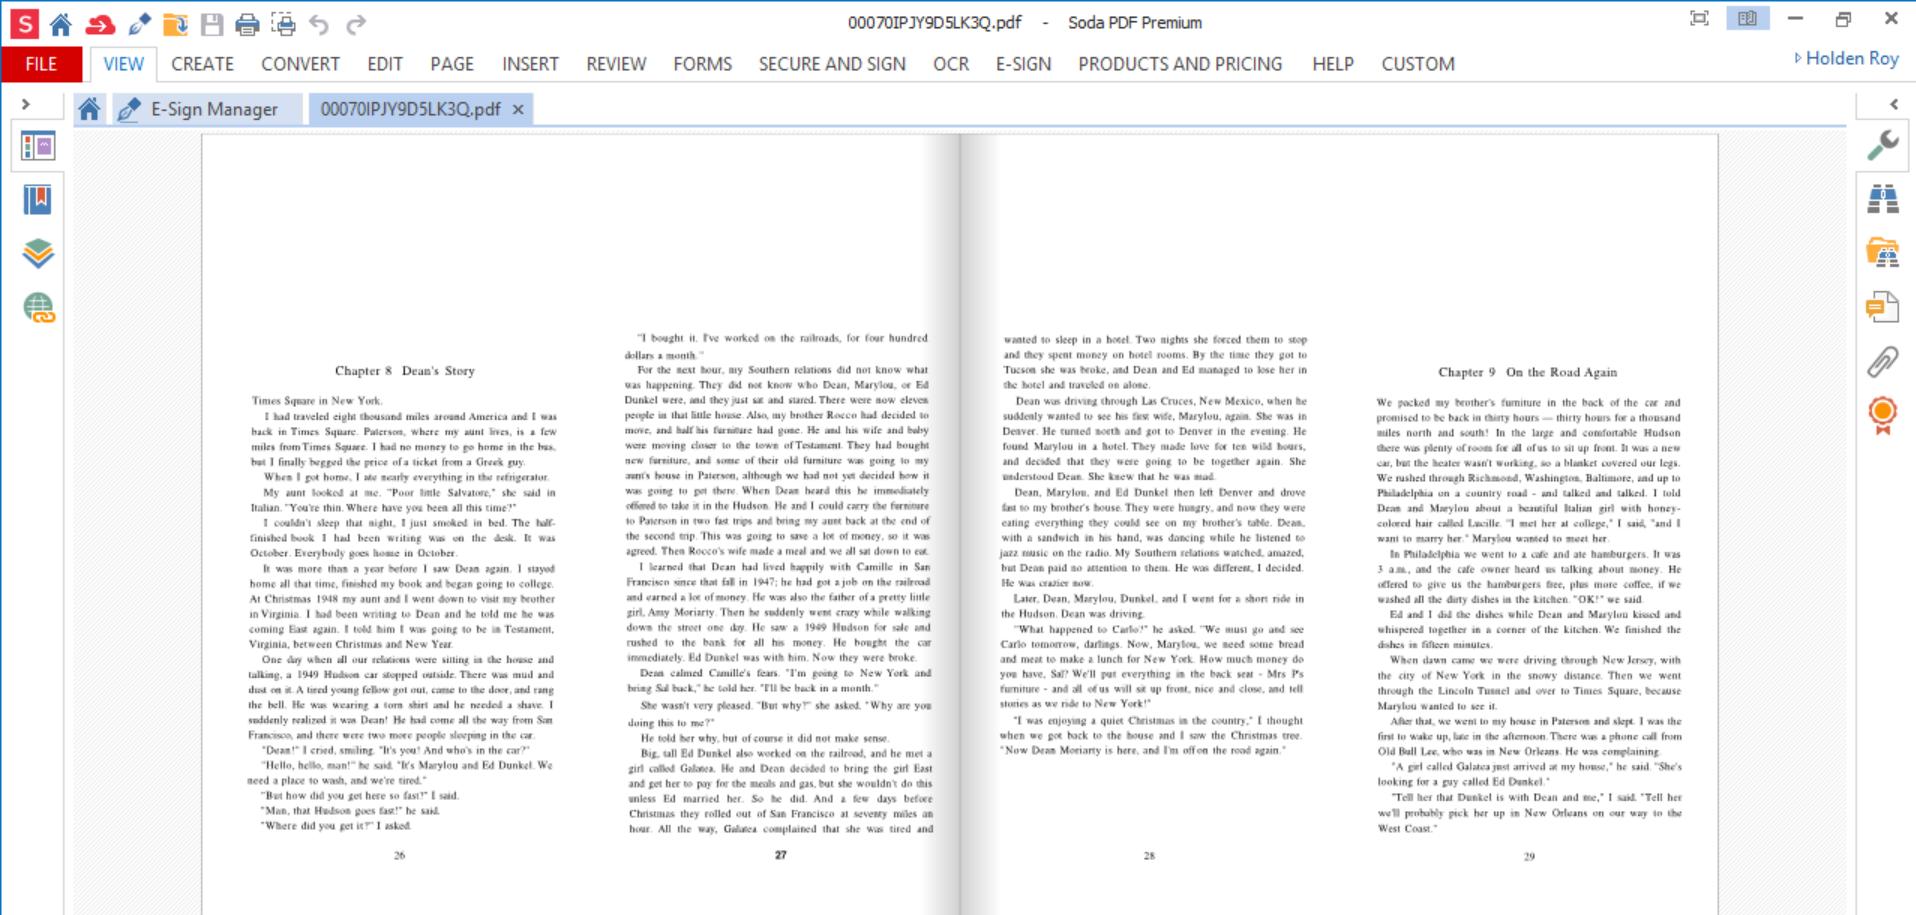 Soda PDF Free EBook Readers